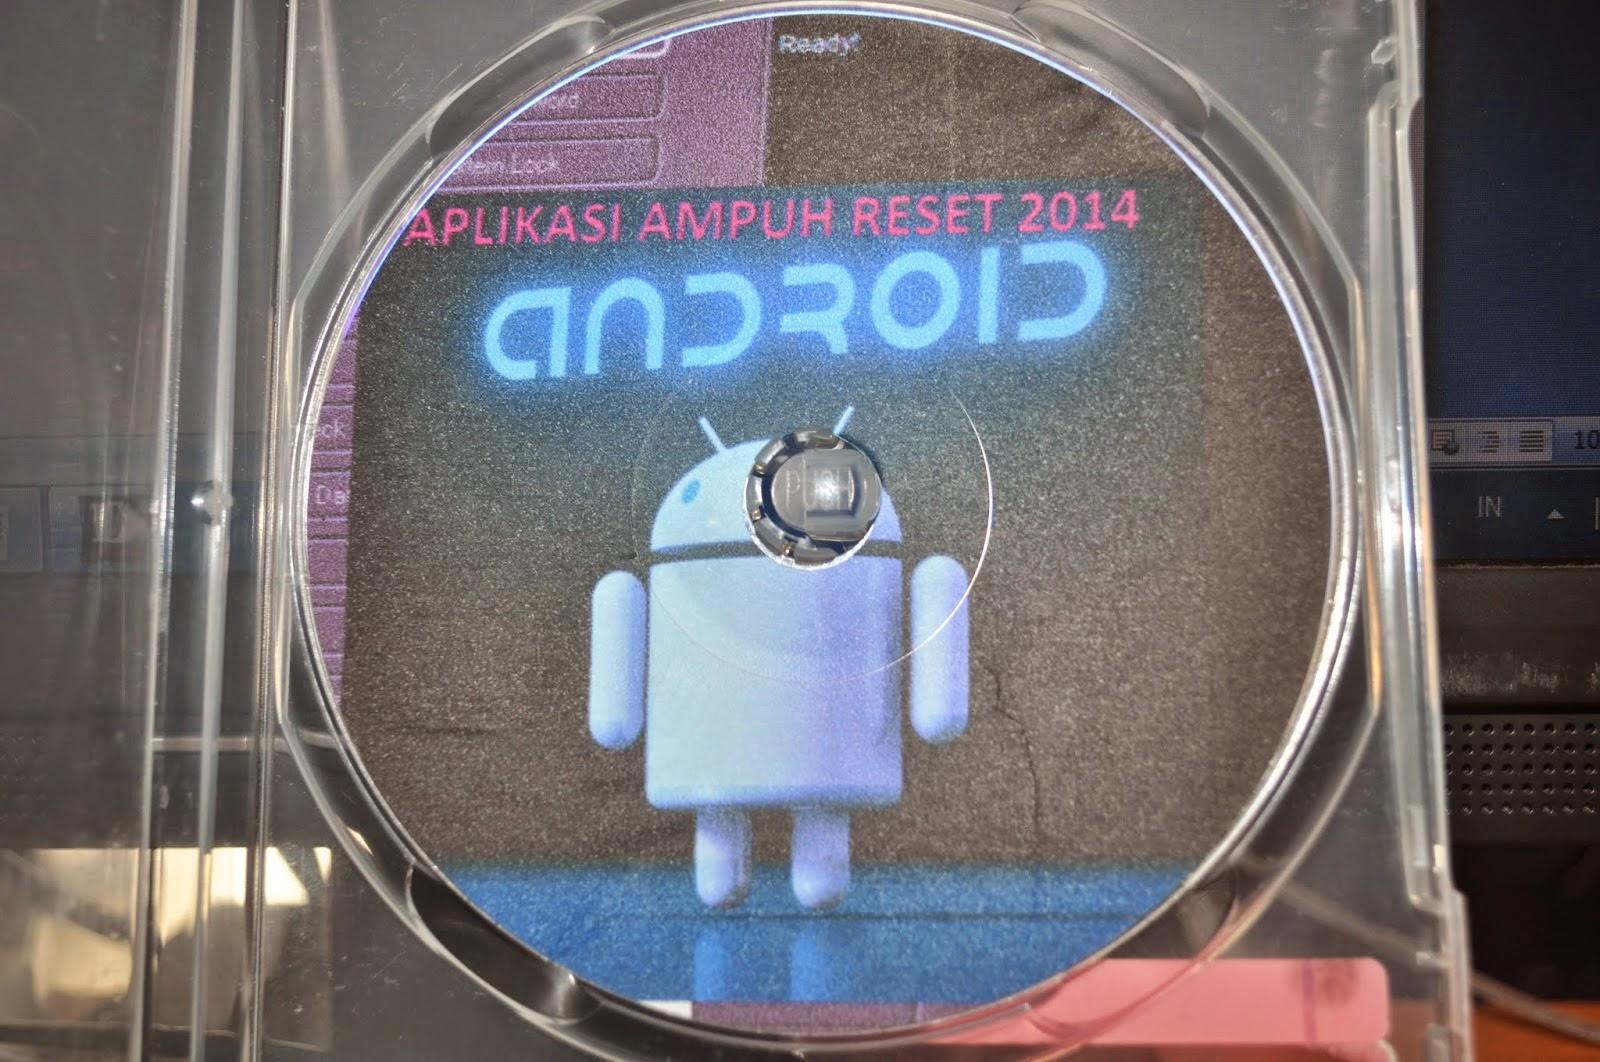 http://danaubirukawal.blogspot.com/2014/05/aplikasi-ampuh-reset-android.html